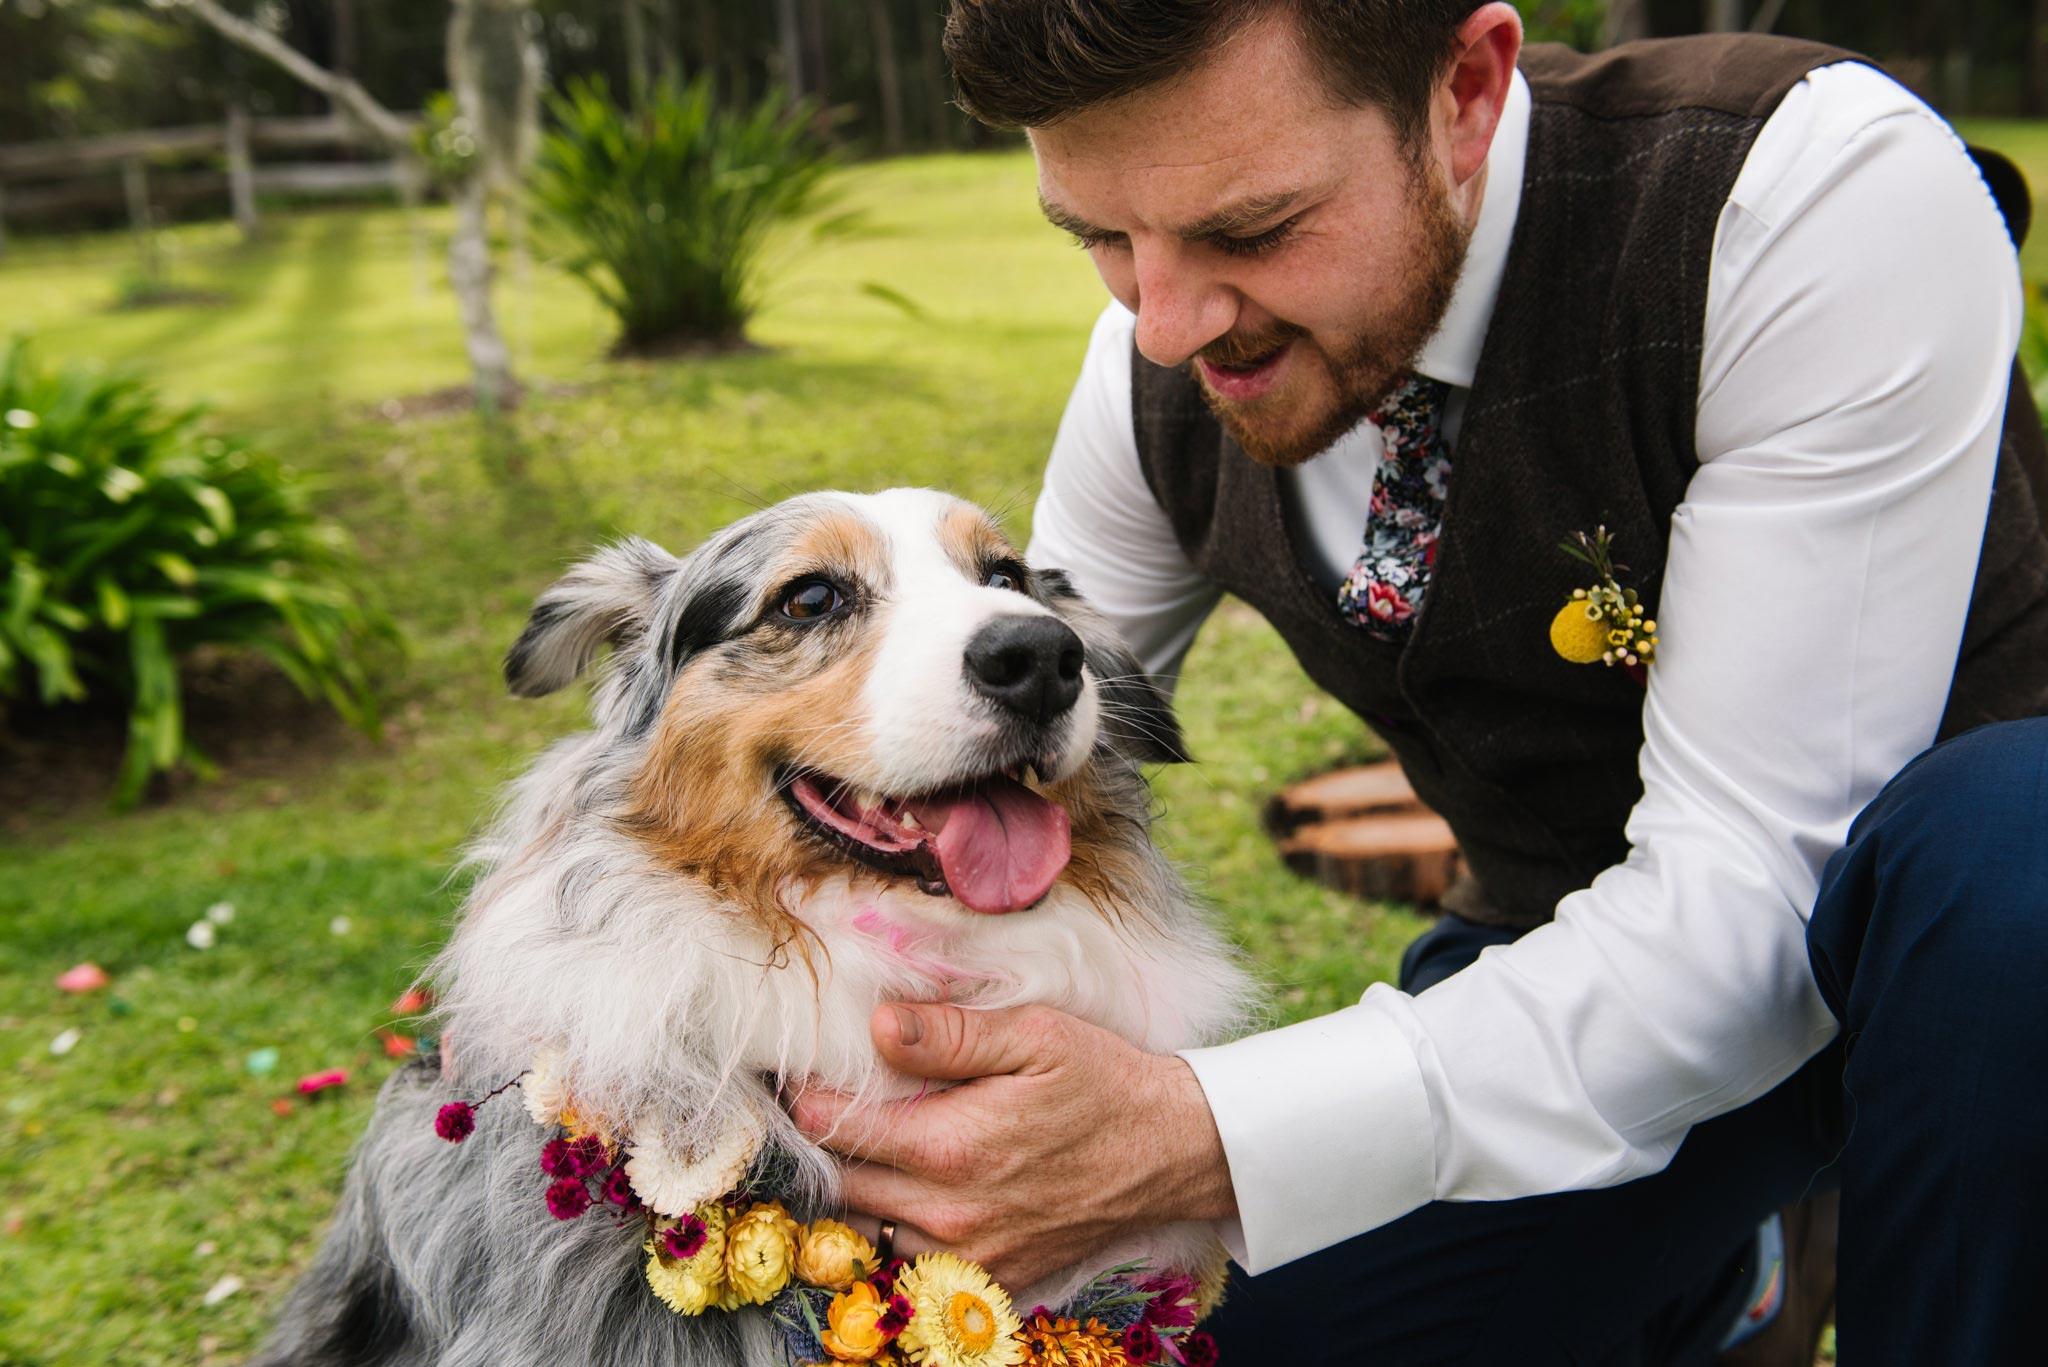 Groom hugging his dog